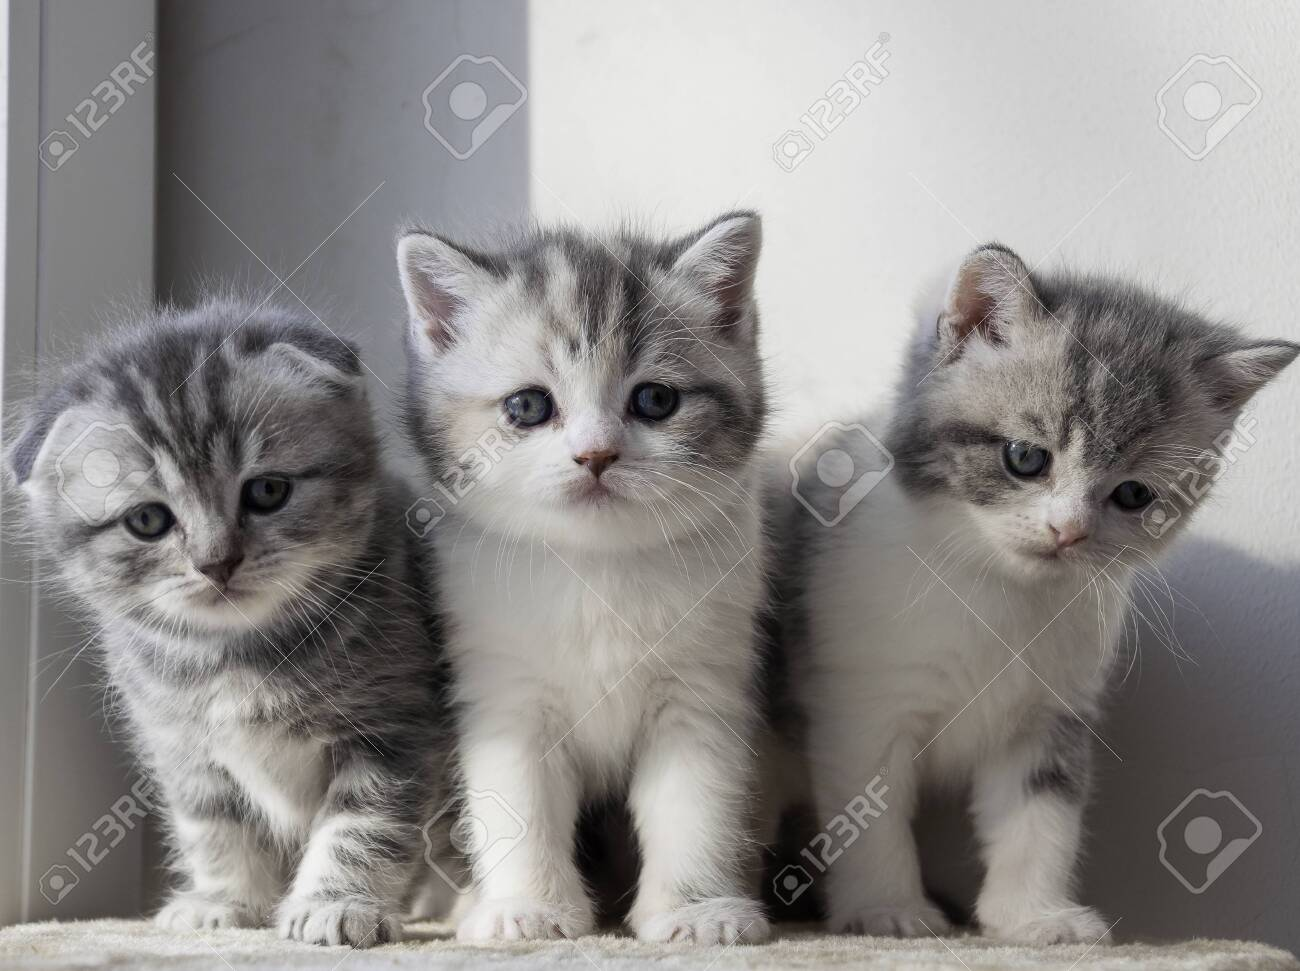 various british kittens sitting on beige plaid - 151138822